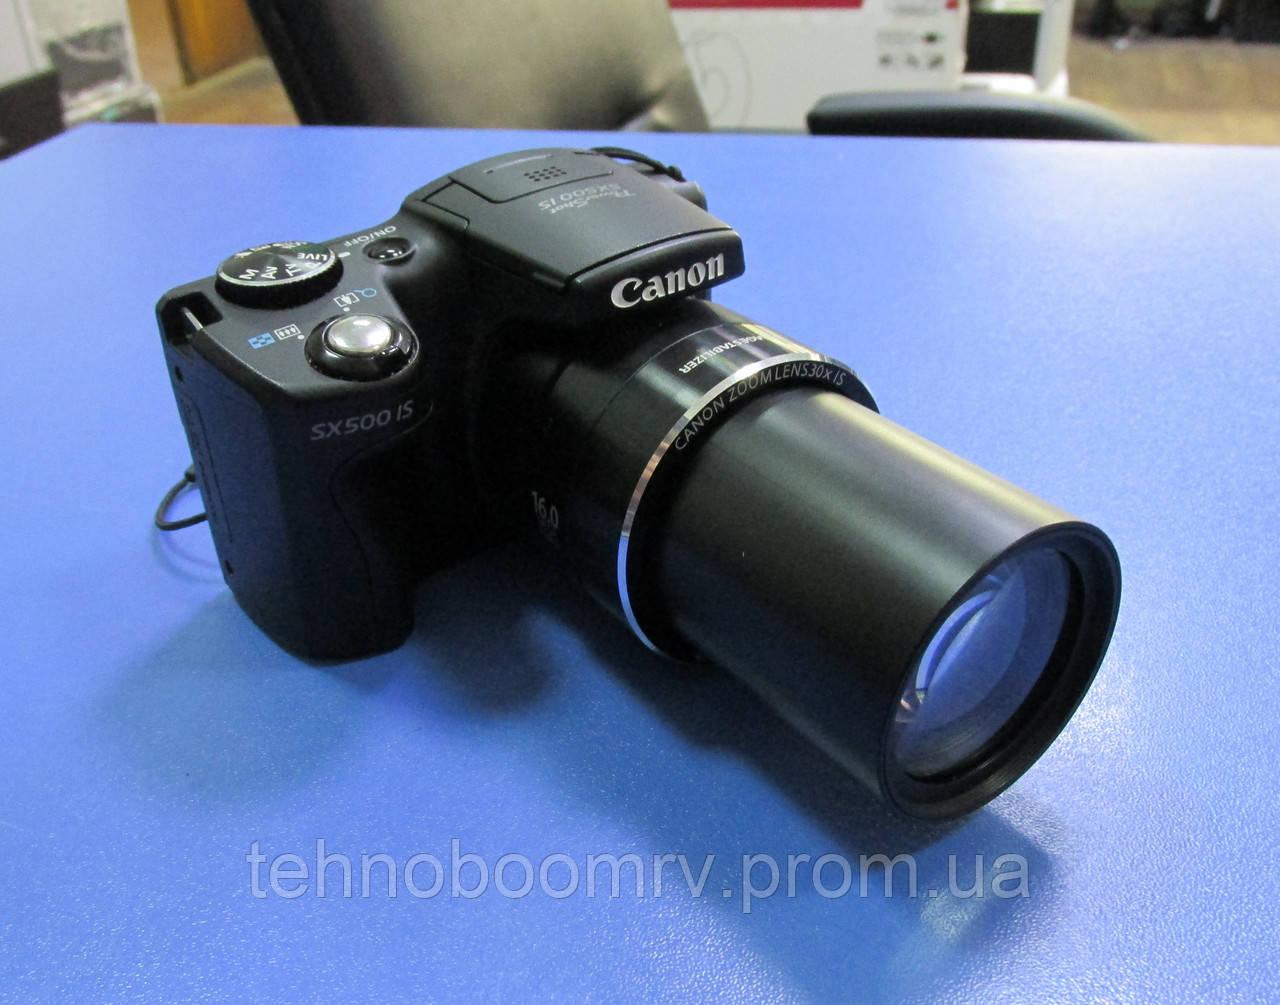 Canon PowerShot SX500 IS - 16MP - ЗУМ: Оптич. 30Х; Цифр. 4Х